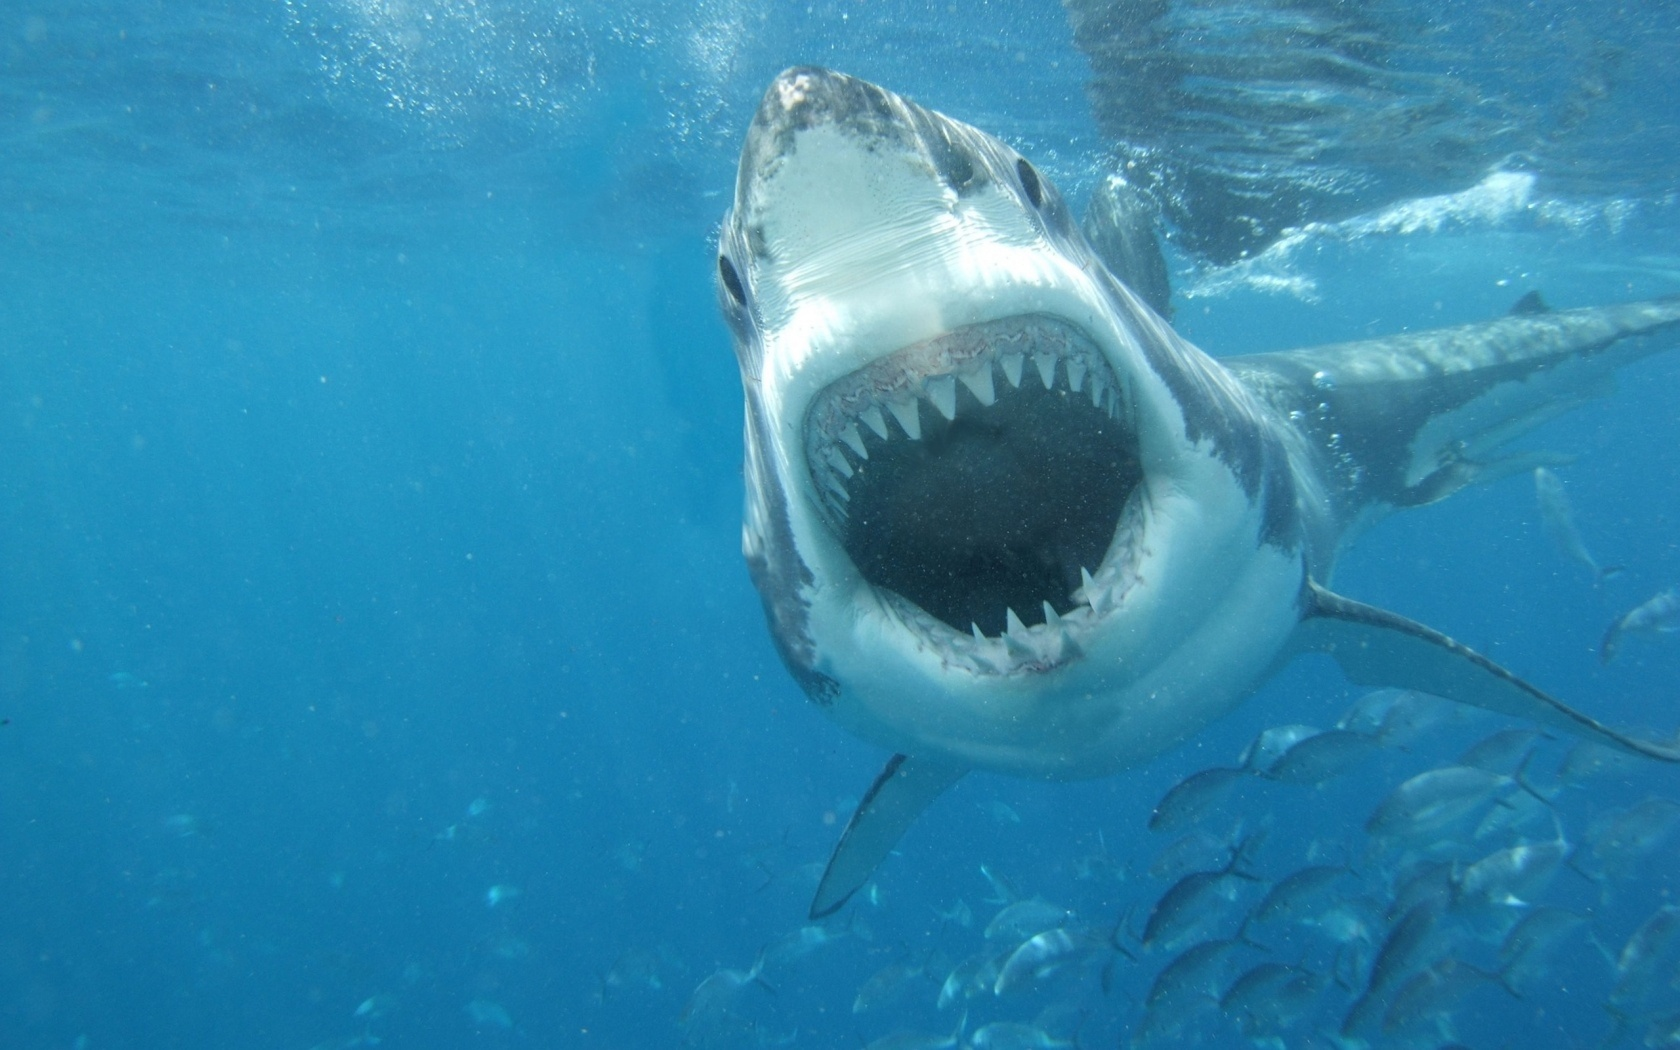 animals on emaze great white shark